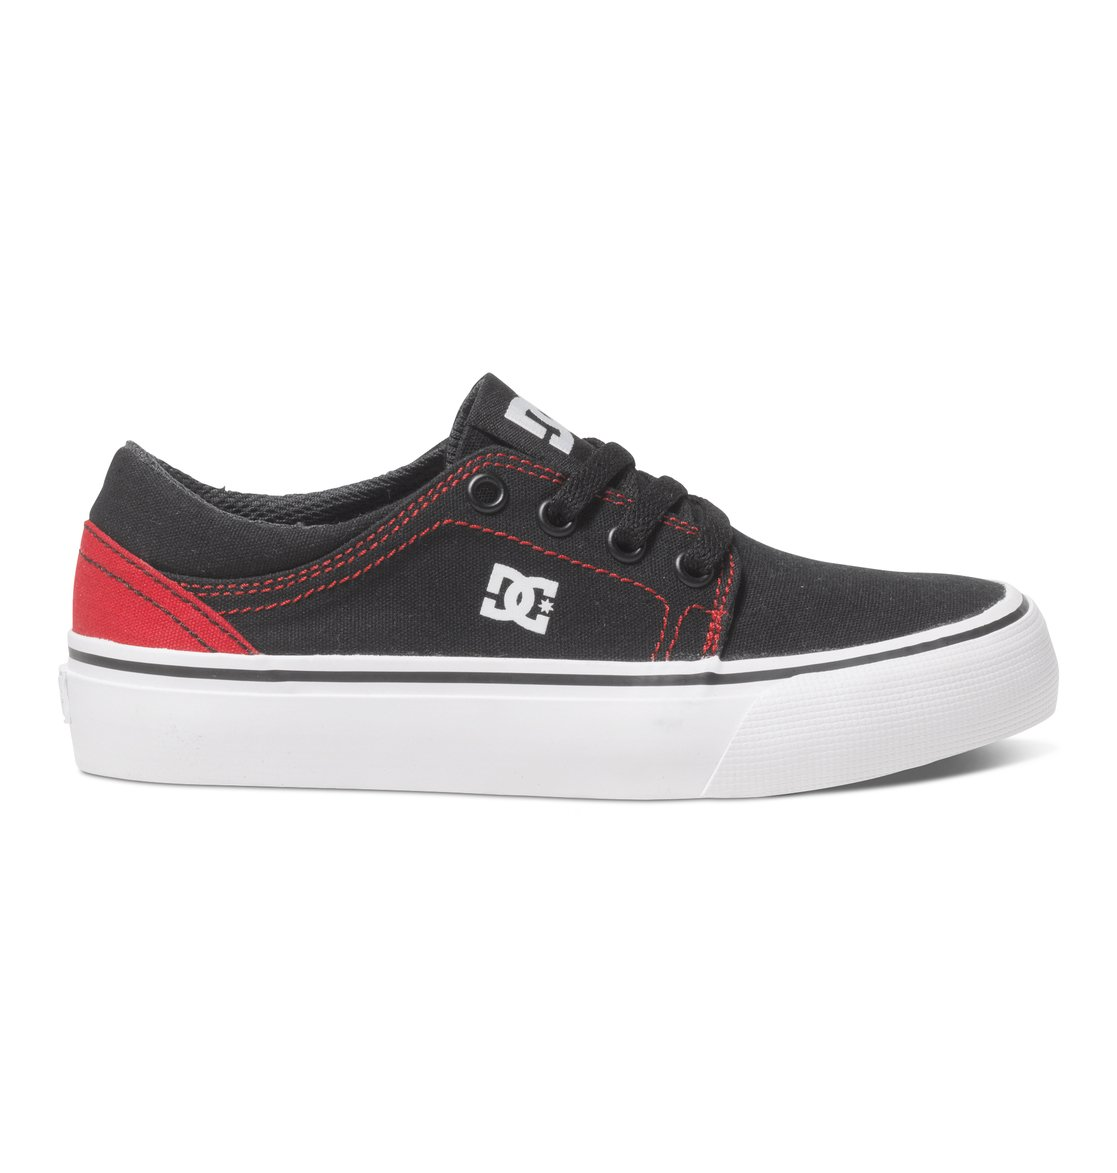 e52a32b2735 0 Trase TX - Chaussures basses Noir ADBS300084 DC Shoes